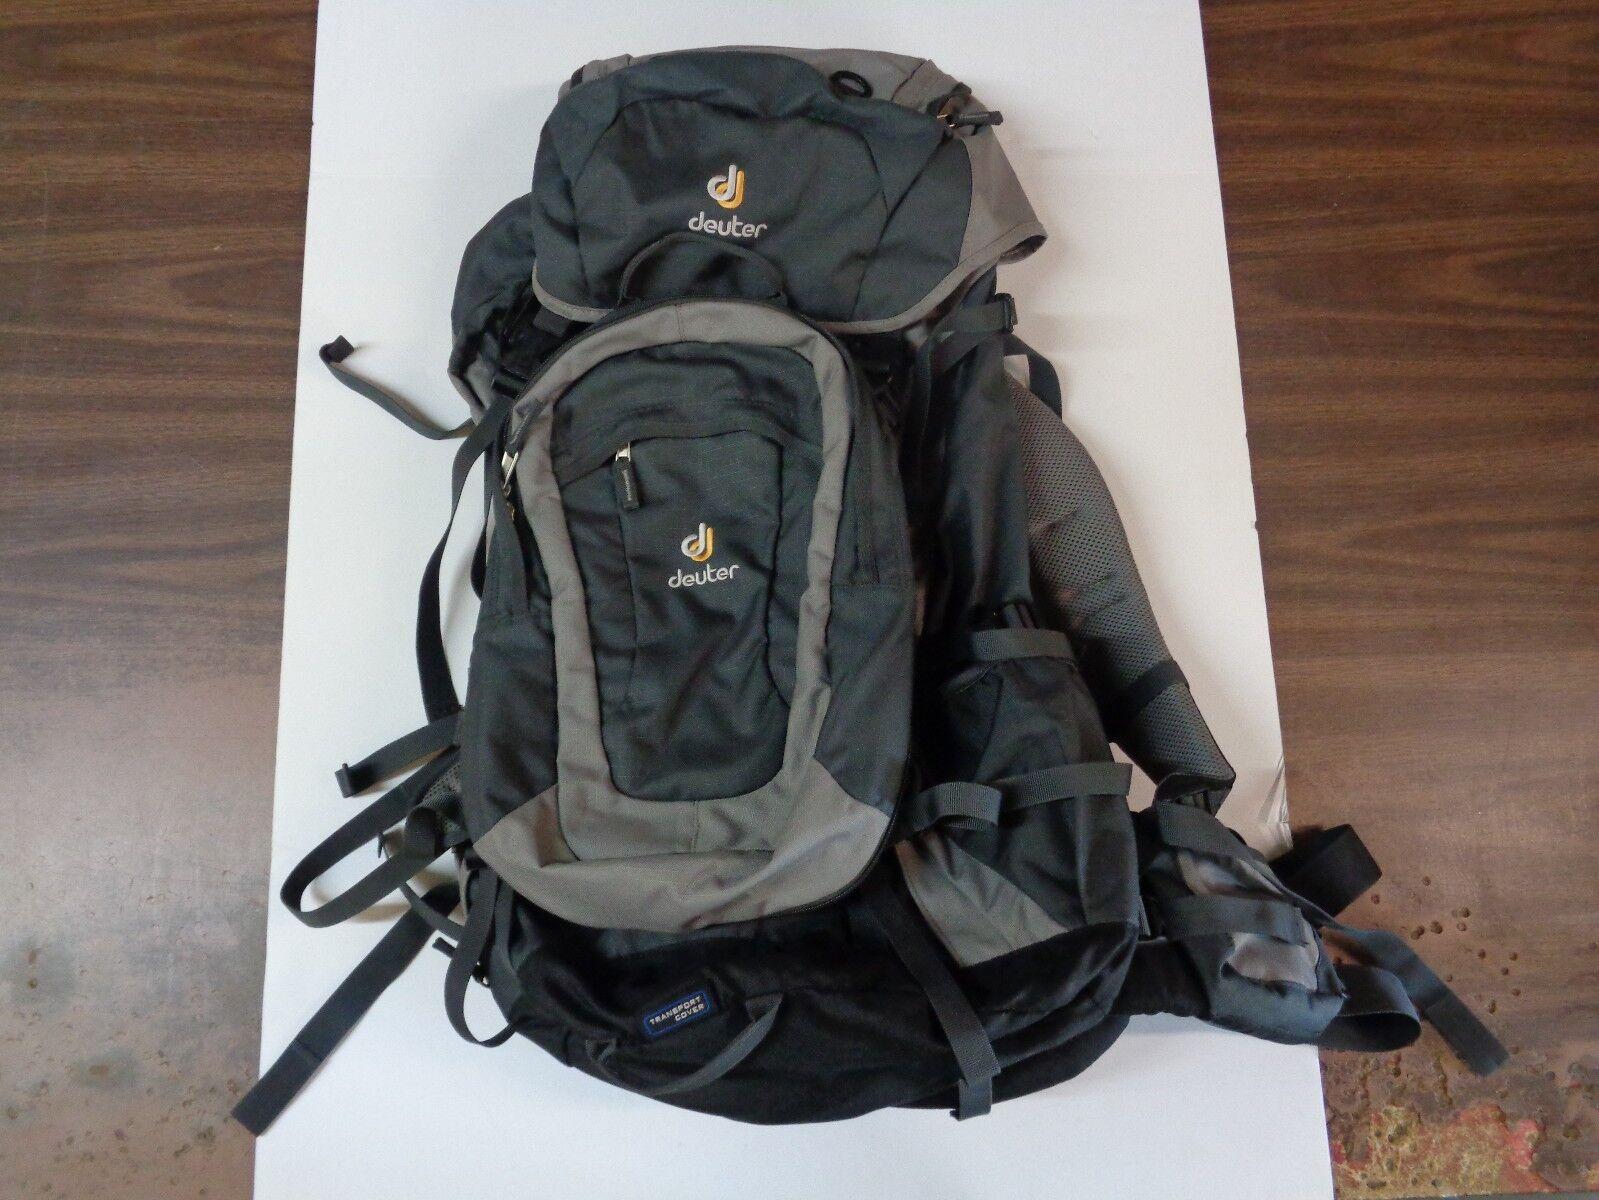 NEW Deuter Quantum 55+10 Hiking Travel Backpack Anthracite - Flint w/ Daypack